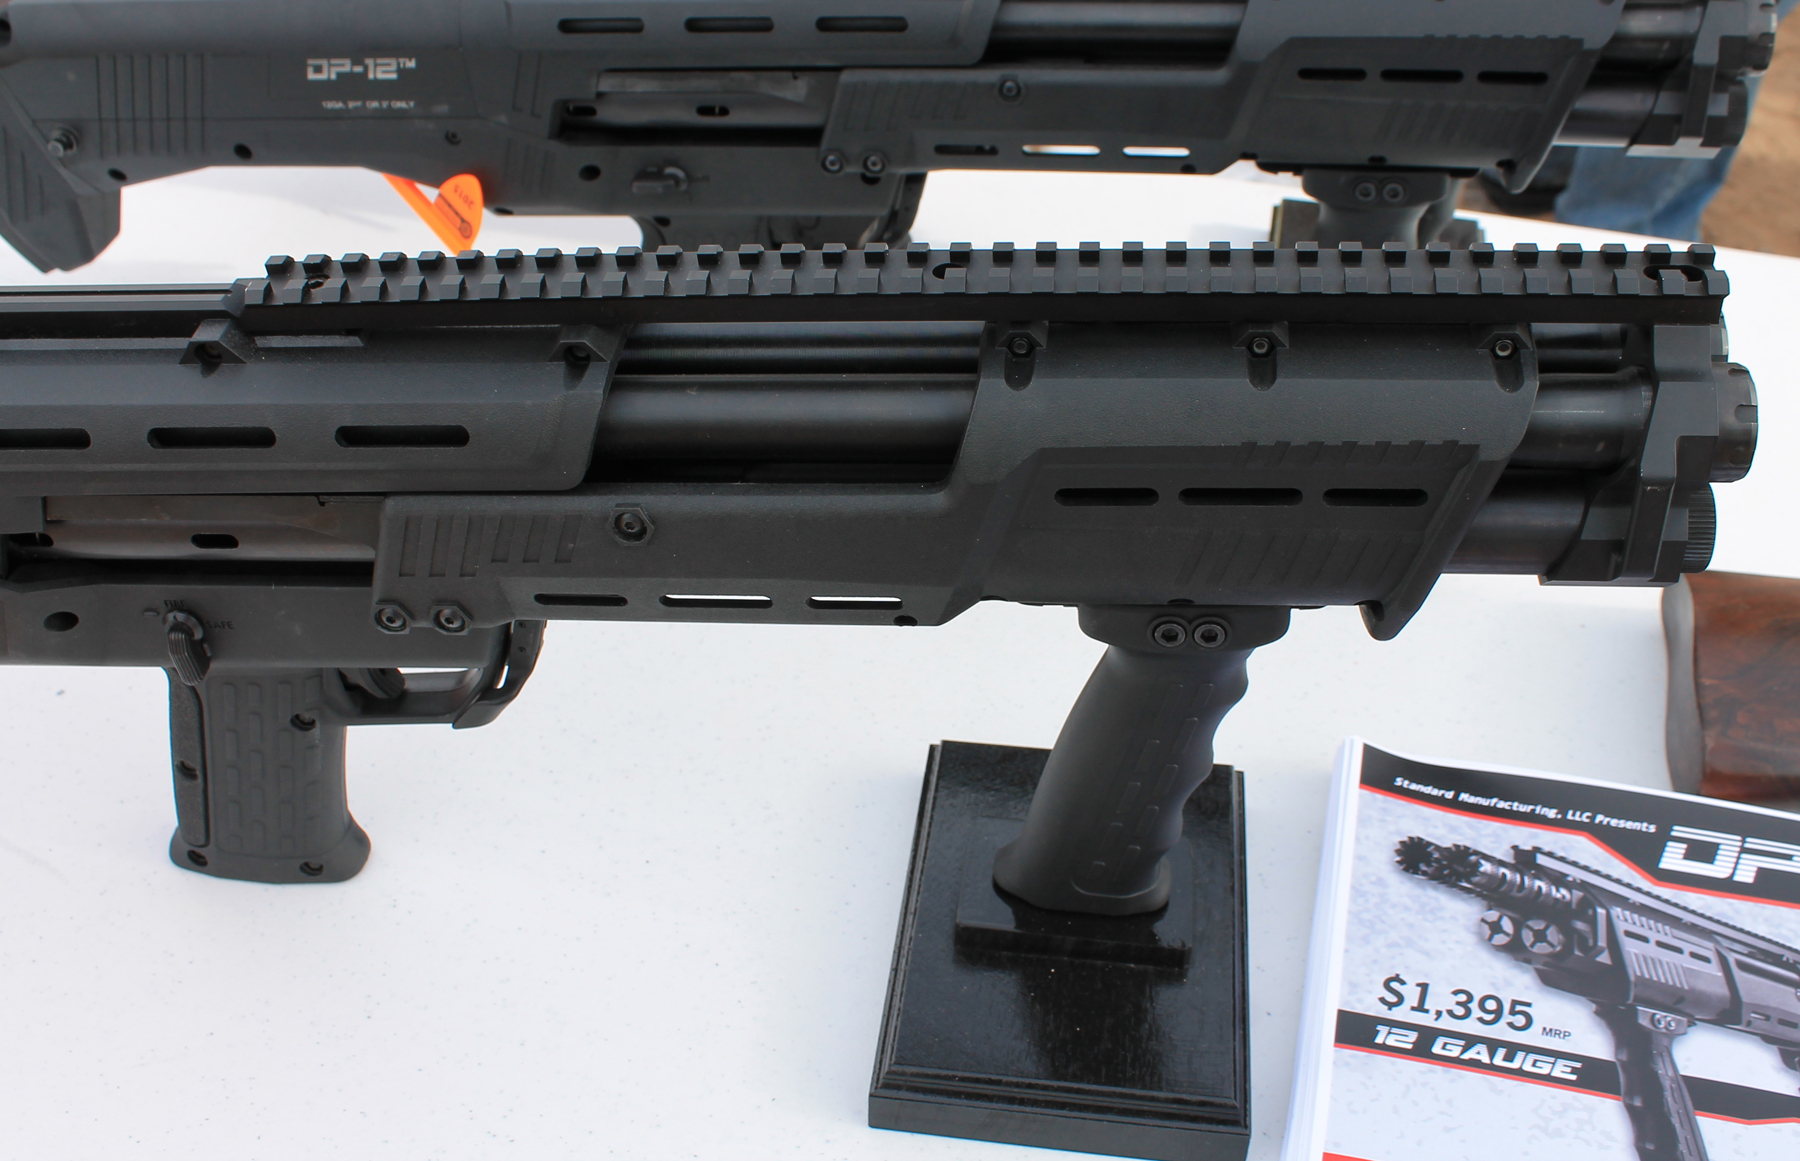 Standard DP-12 foregrip